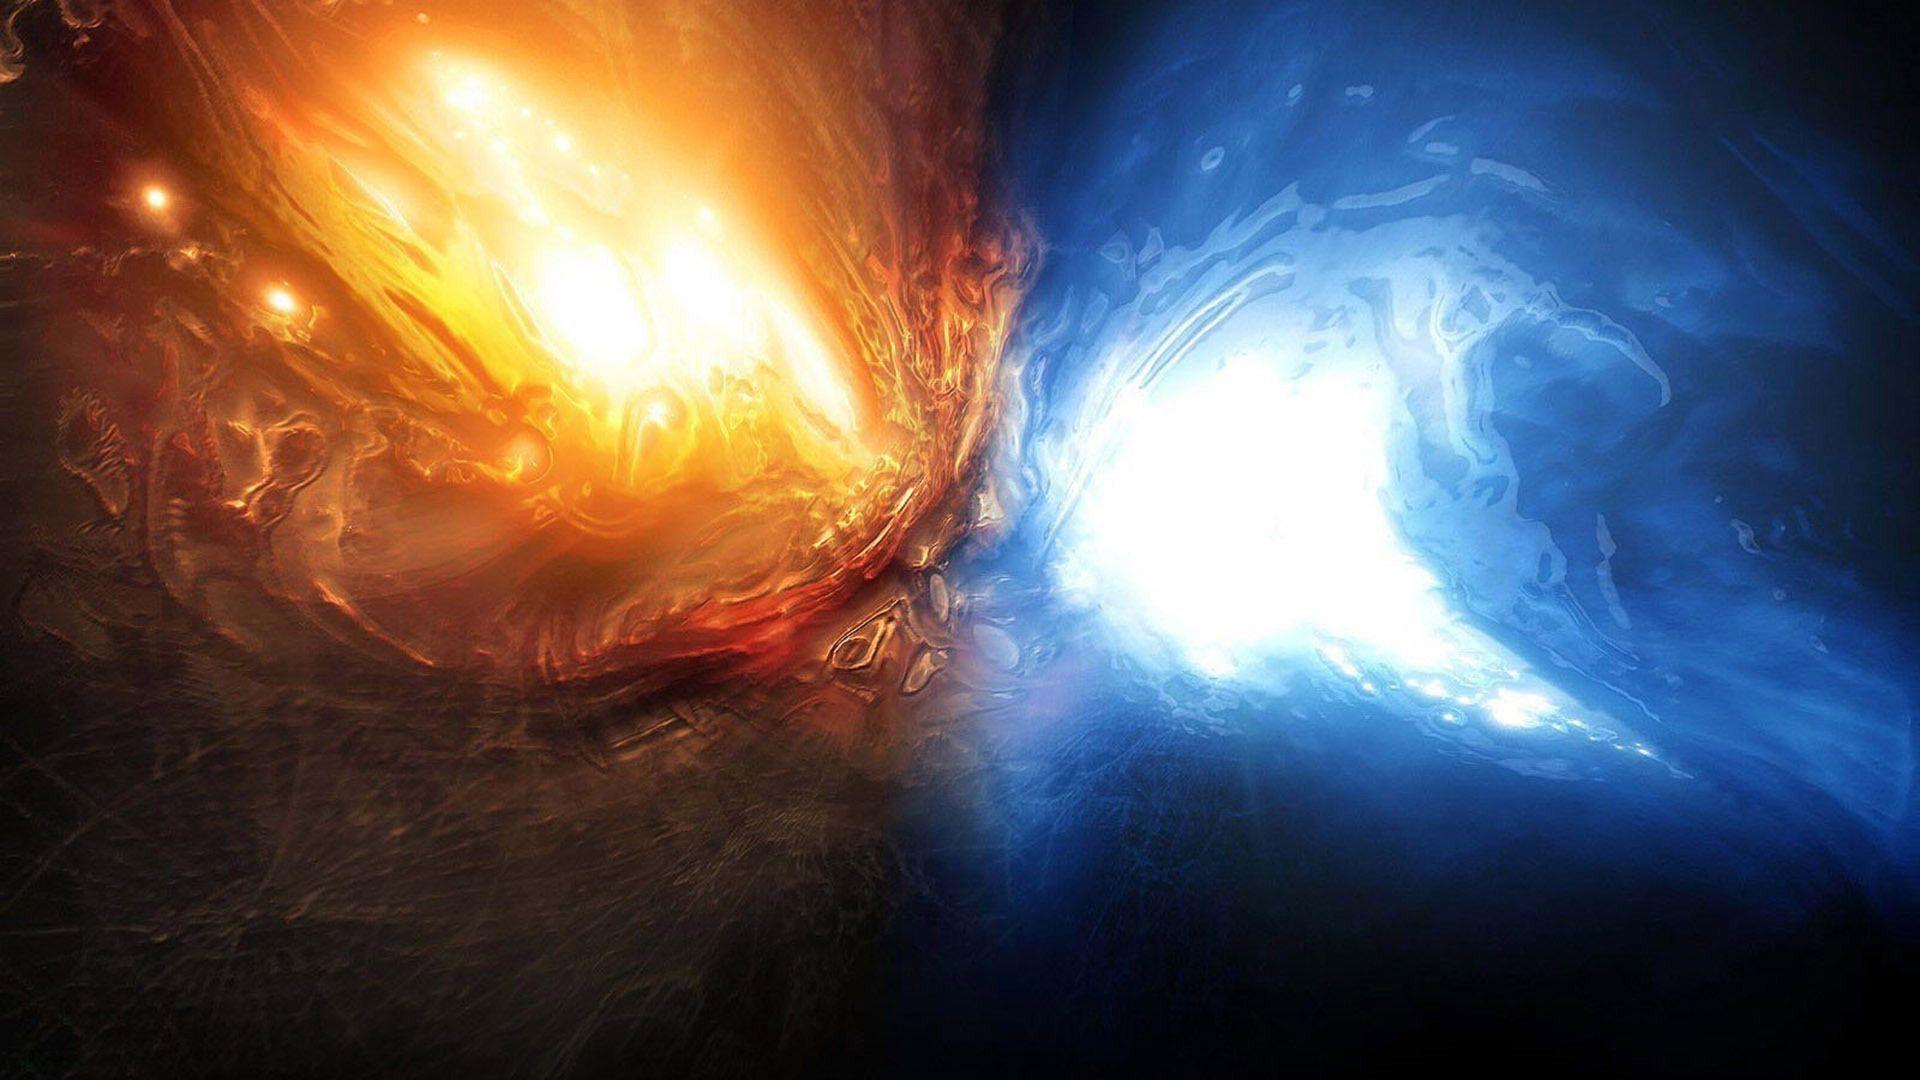 Fire and water wallpaper | Download Wallpaper | Pinterest ...